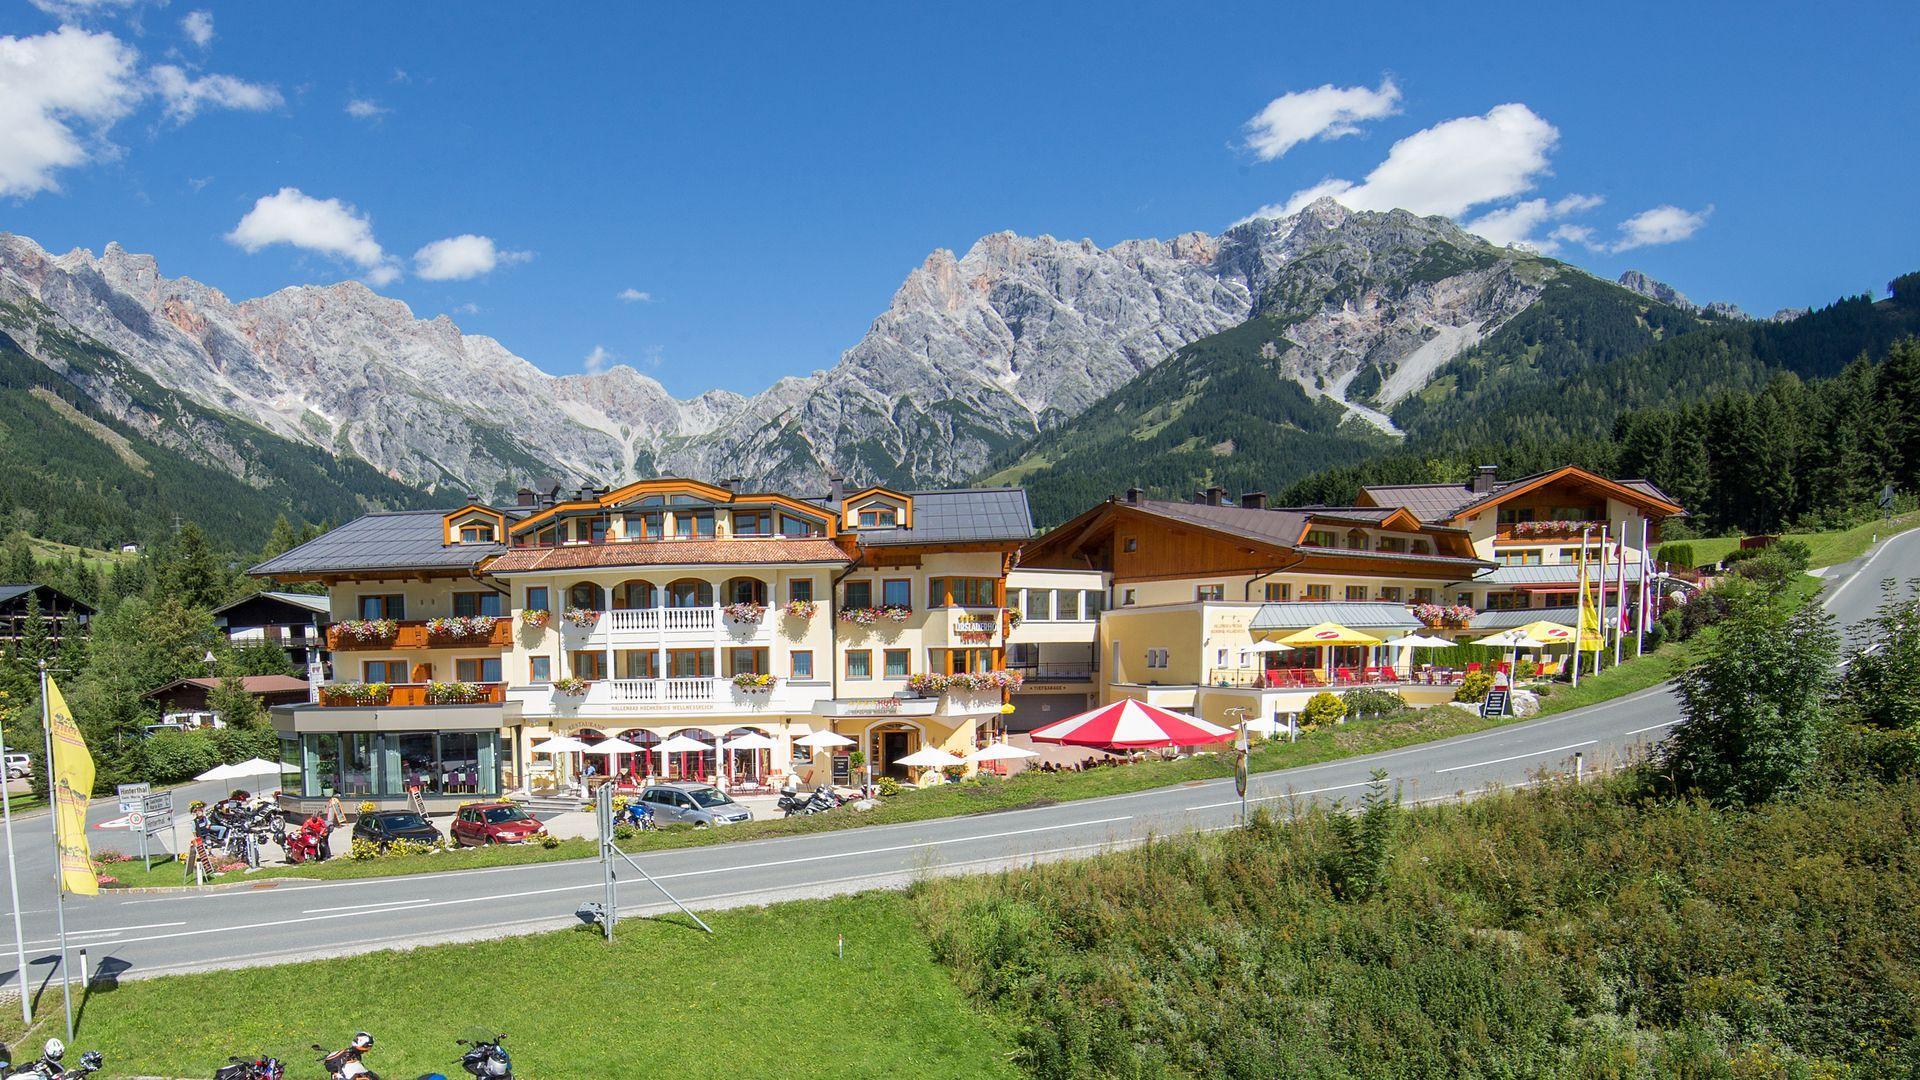 4* Hotel Urslauerhof Berg & Spa